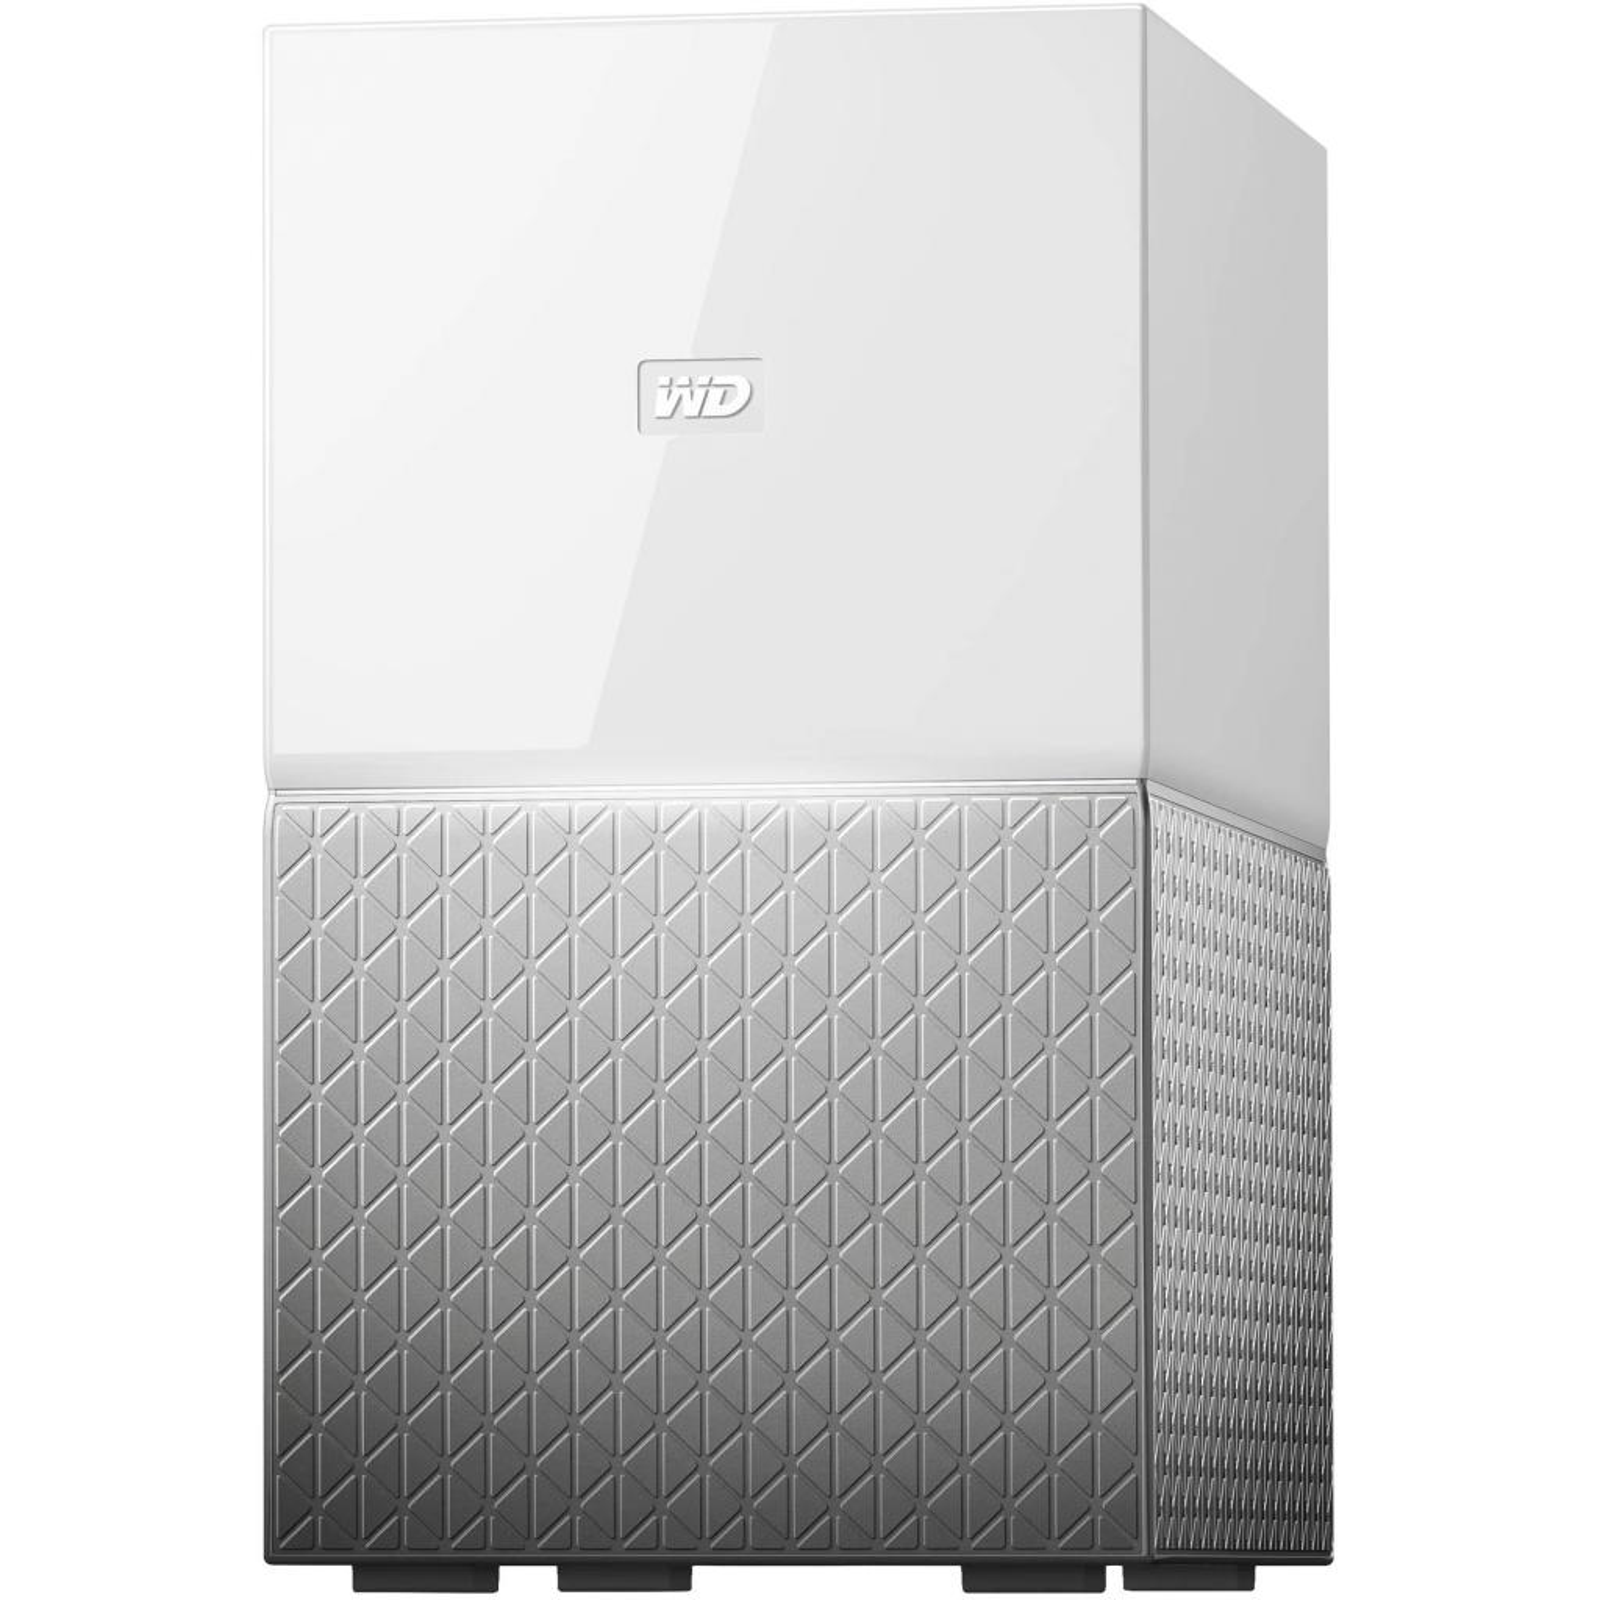 "NAS 3.5"" 6TB My Cloud Home Duo WD (WDBMUT0060JWT-EESN)"